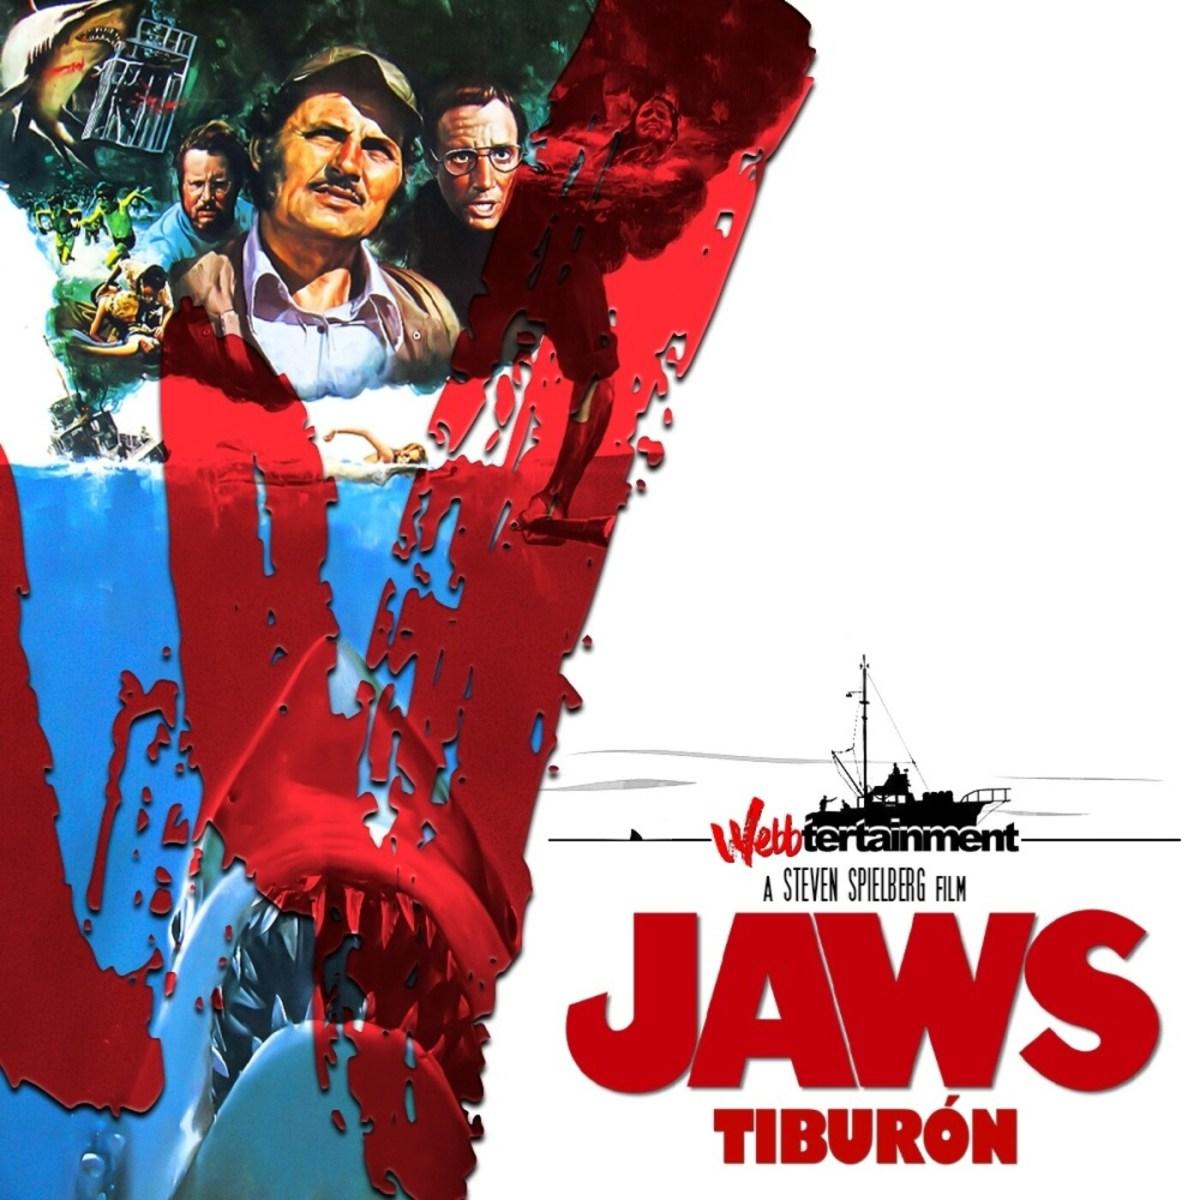 JAWS Tiburón / Steven Spielberg